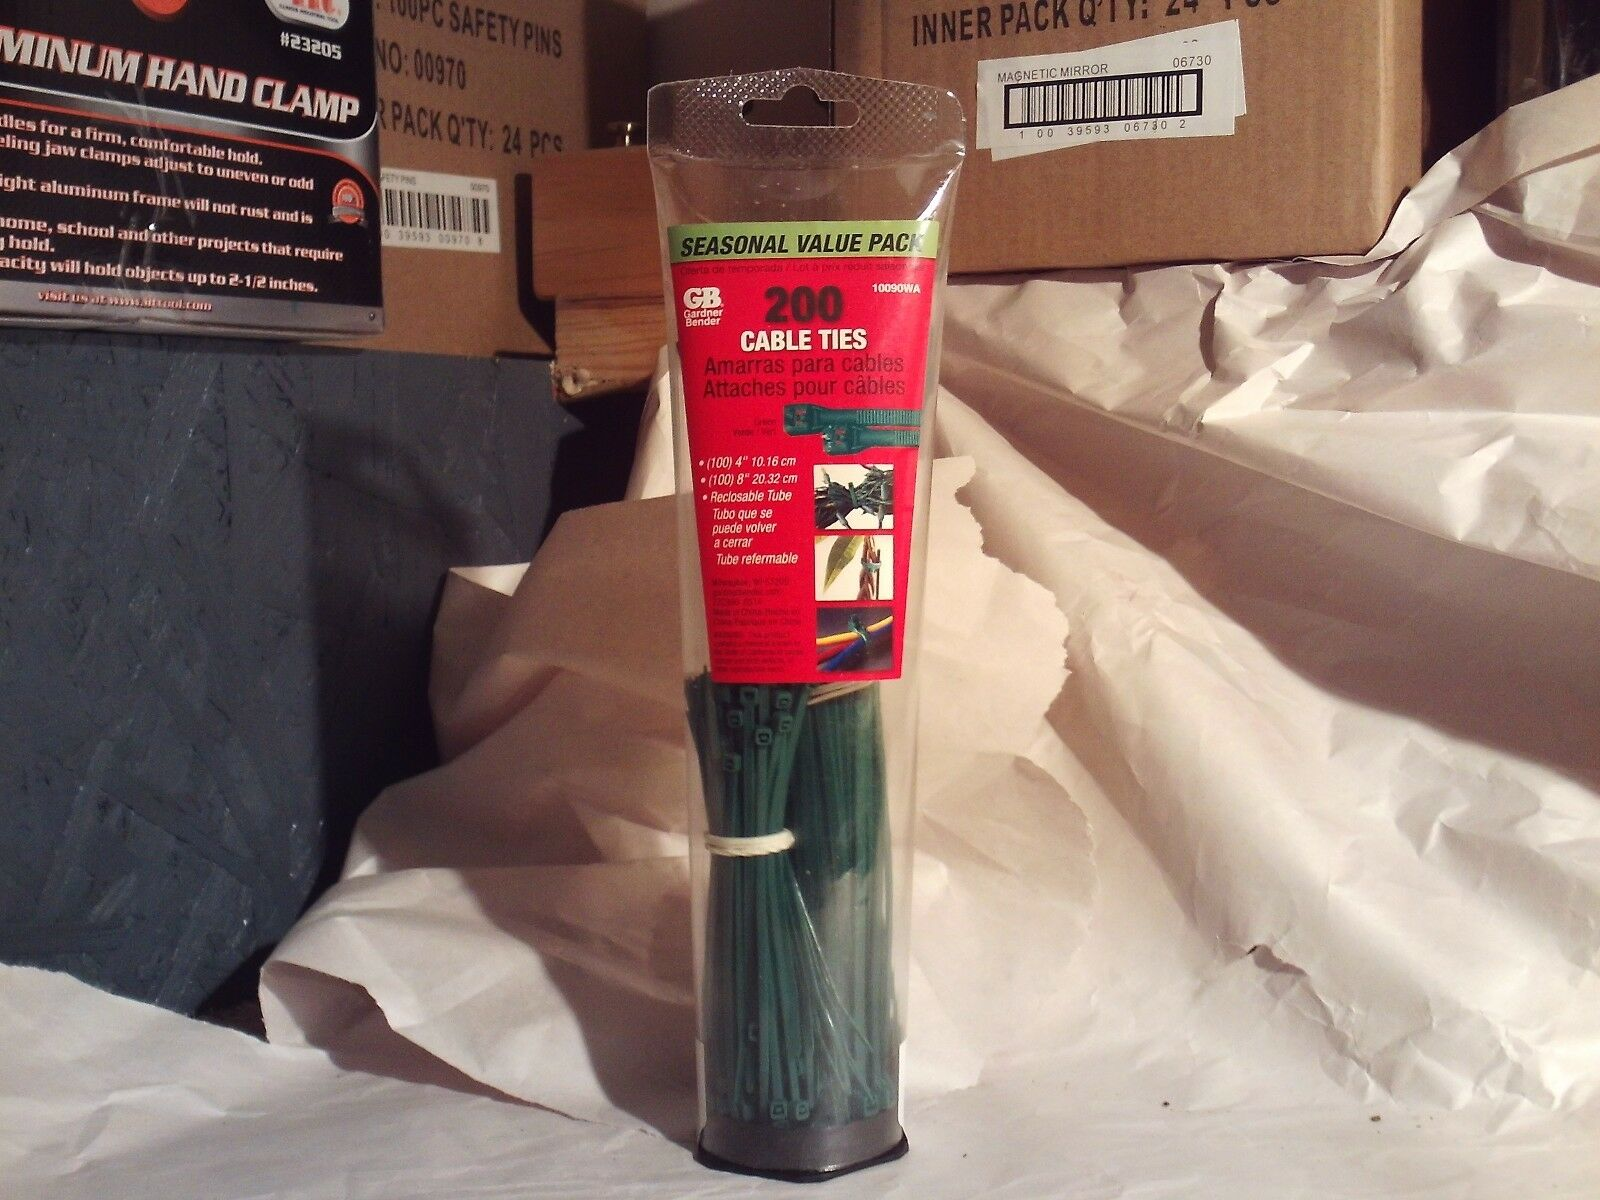 Gardner Bender 10090WA Cable Tie Assortment, 200 Pack, Green